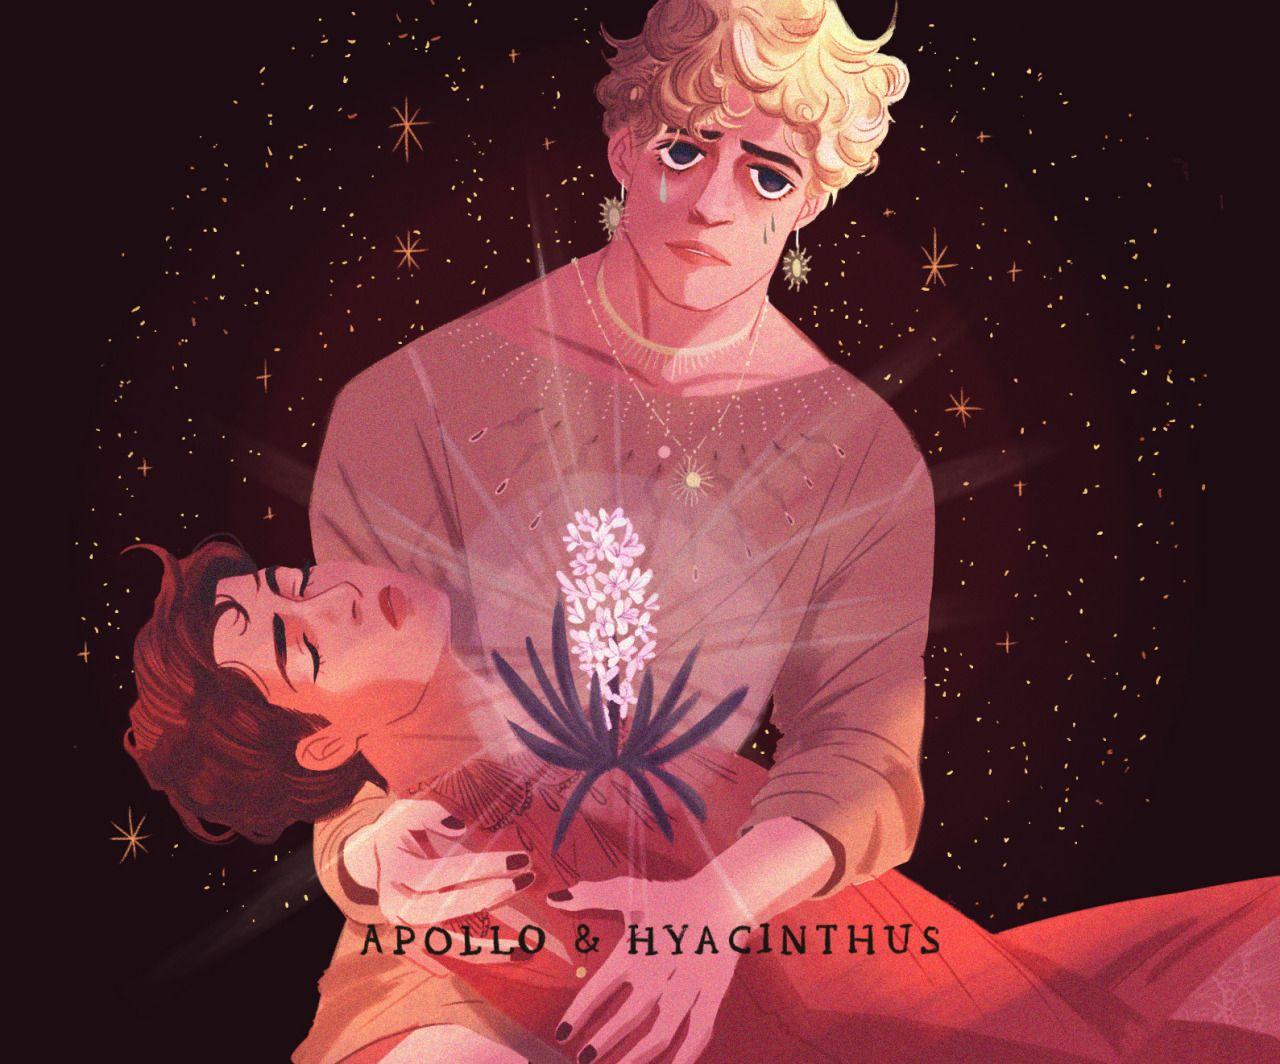 Apollo And Hyacinthus By Stephanie Son Greek Mythology Art Greek And Roman Mythology Mythology